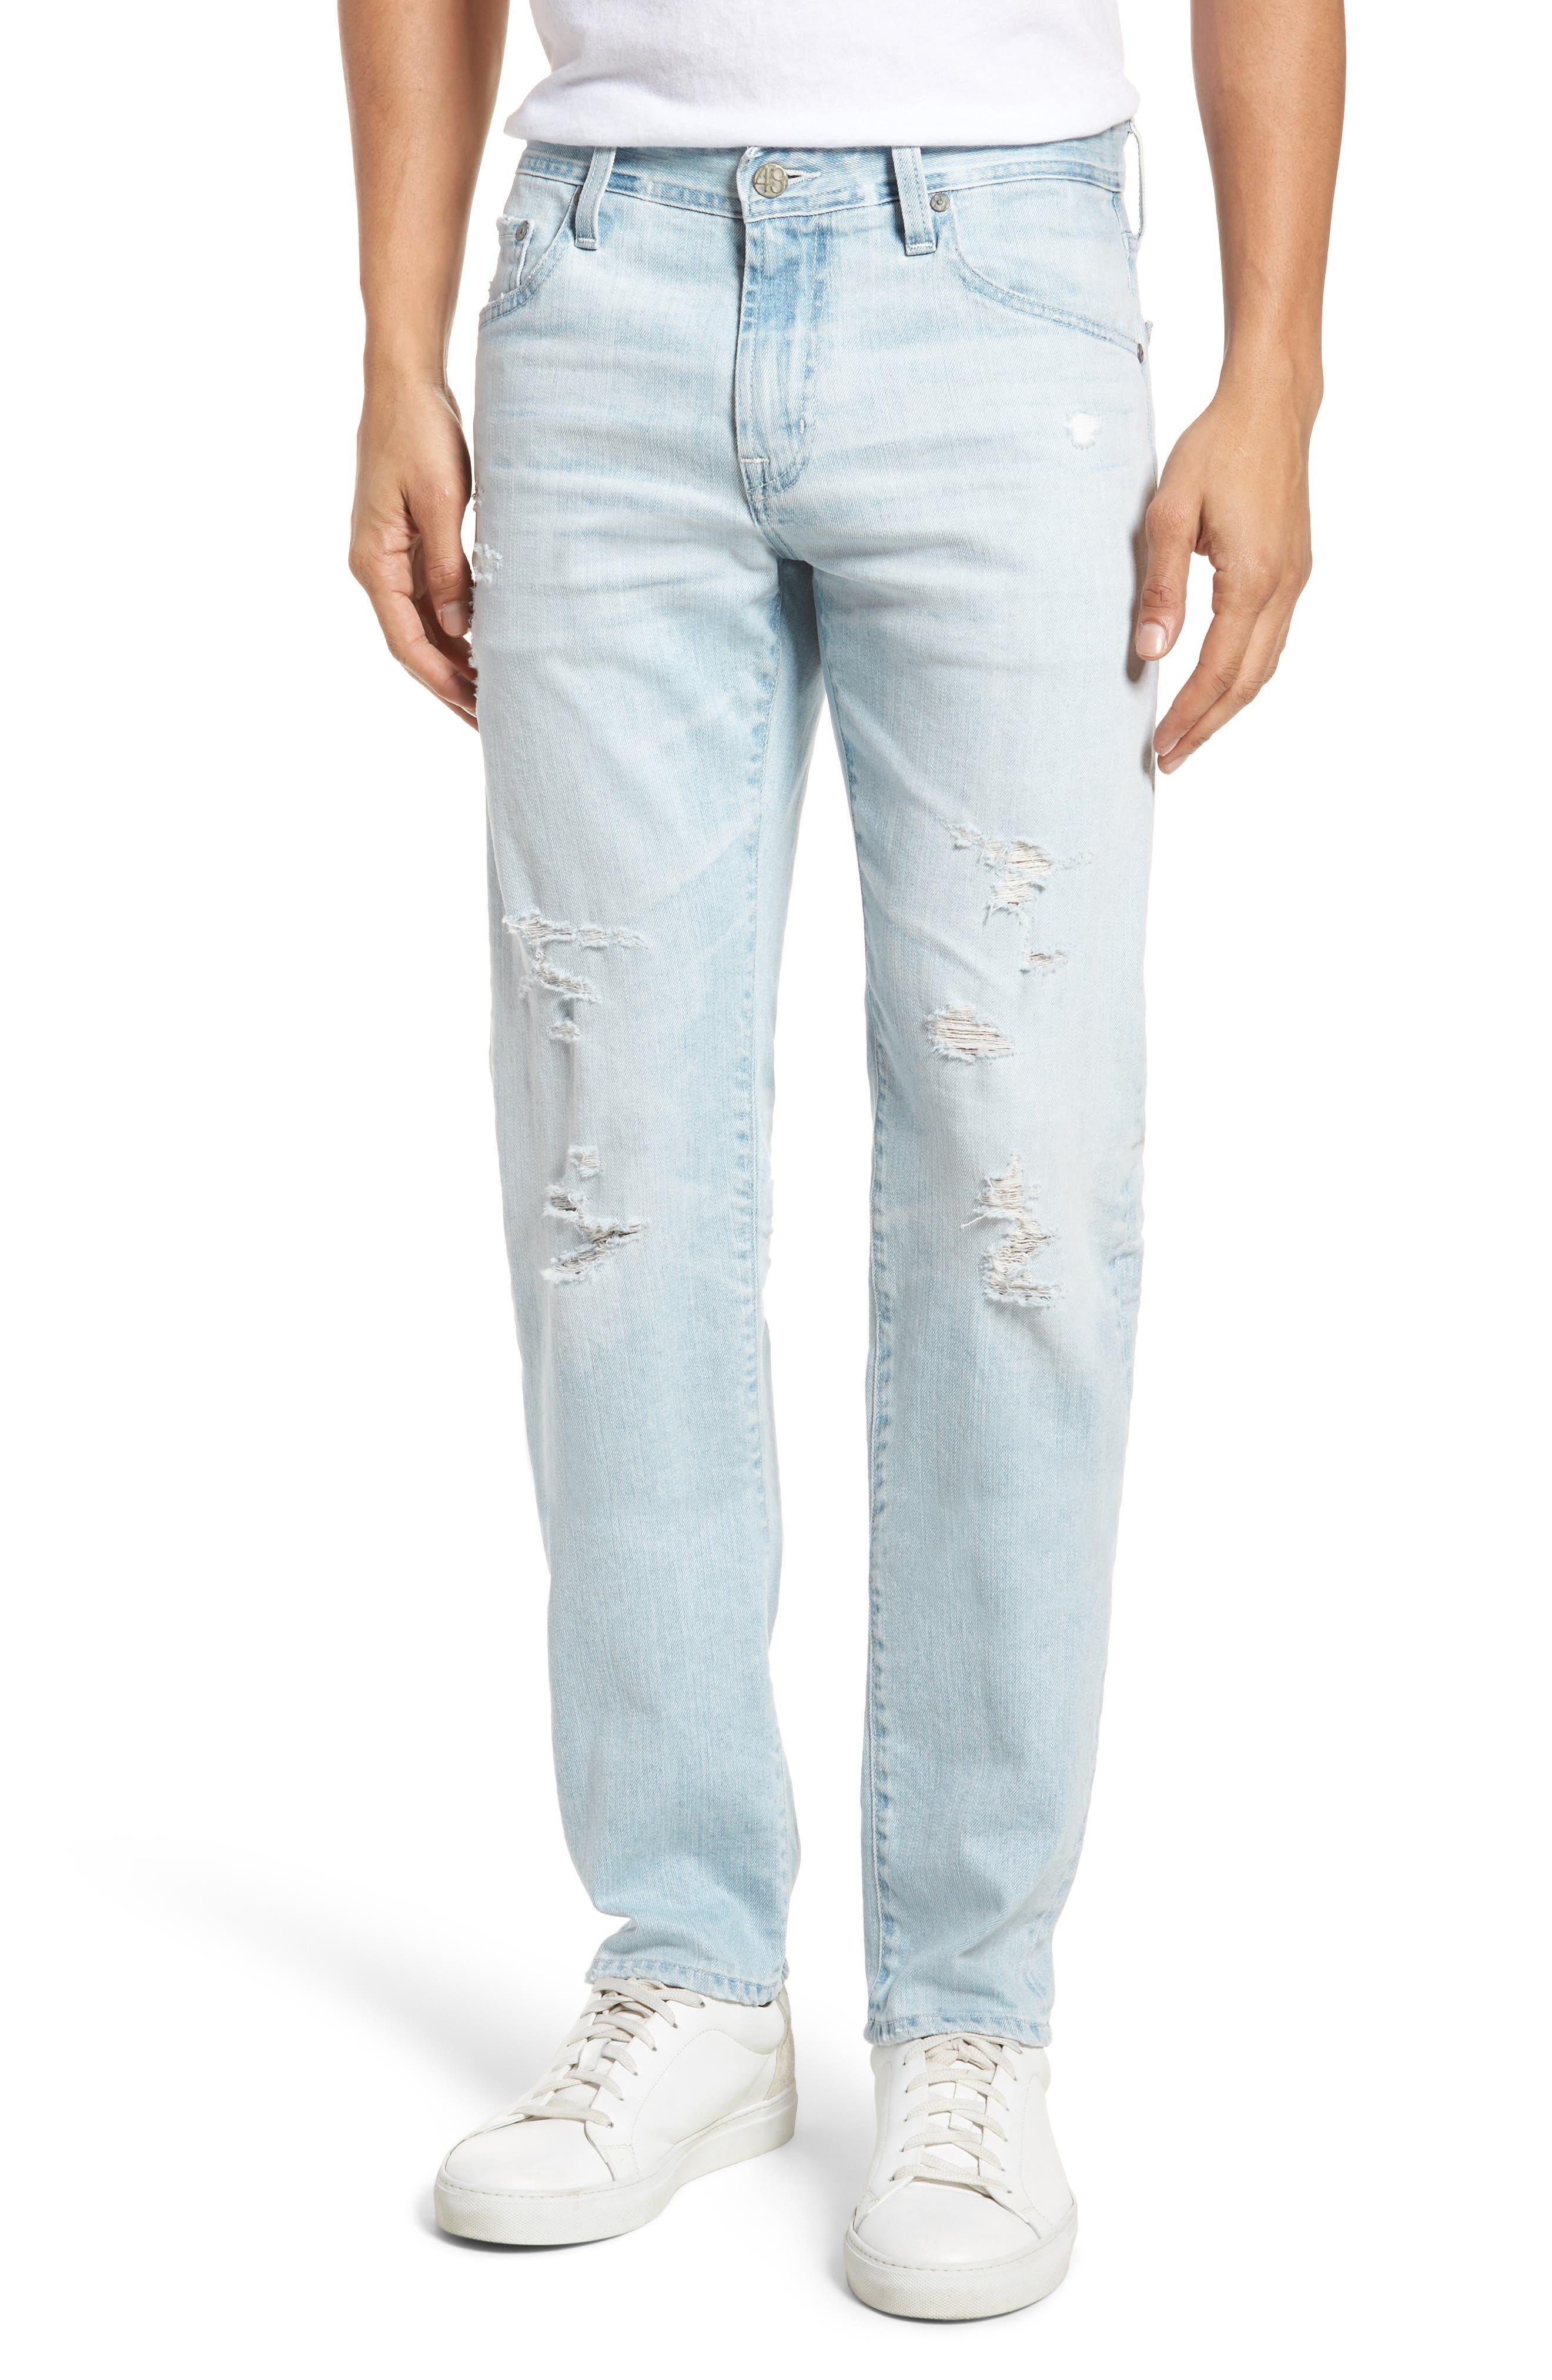 Tellis Slim Fit Jeans,                             Main thumbnail 1, color,                             27 Years Surfrider